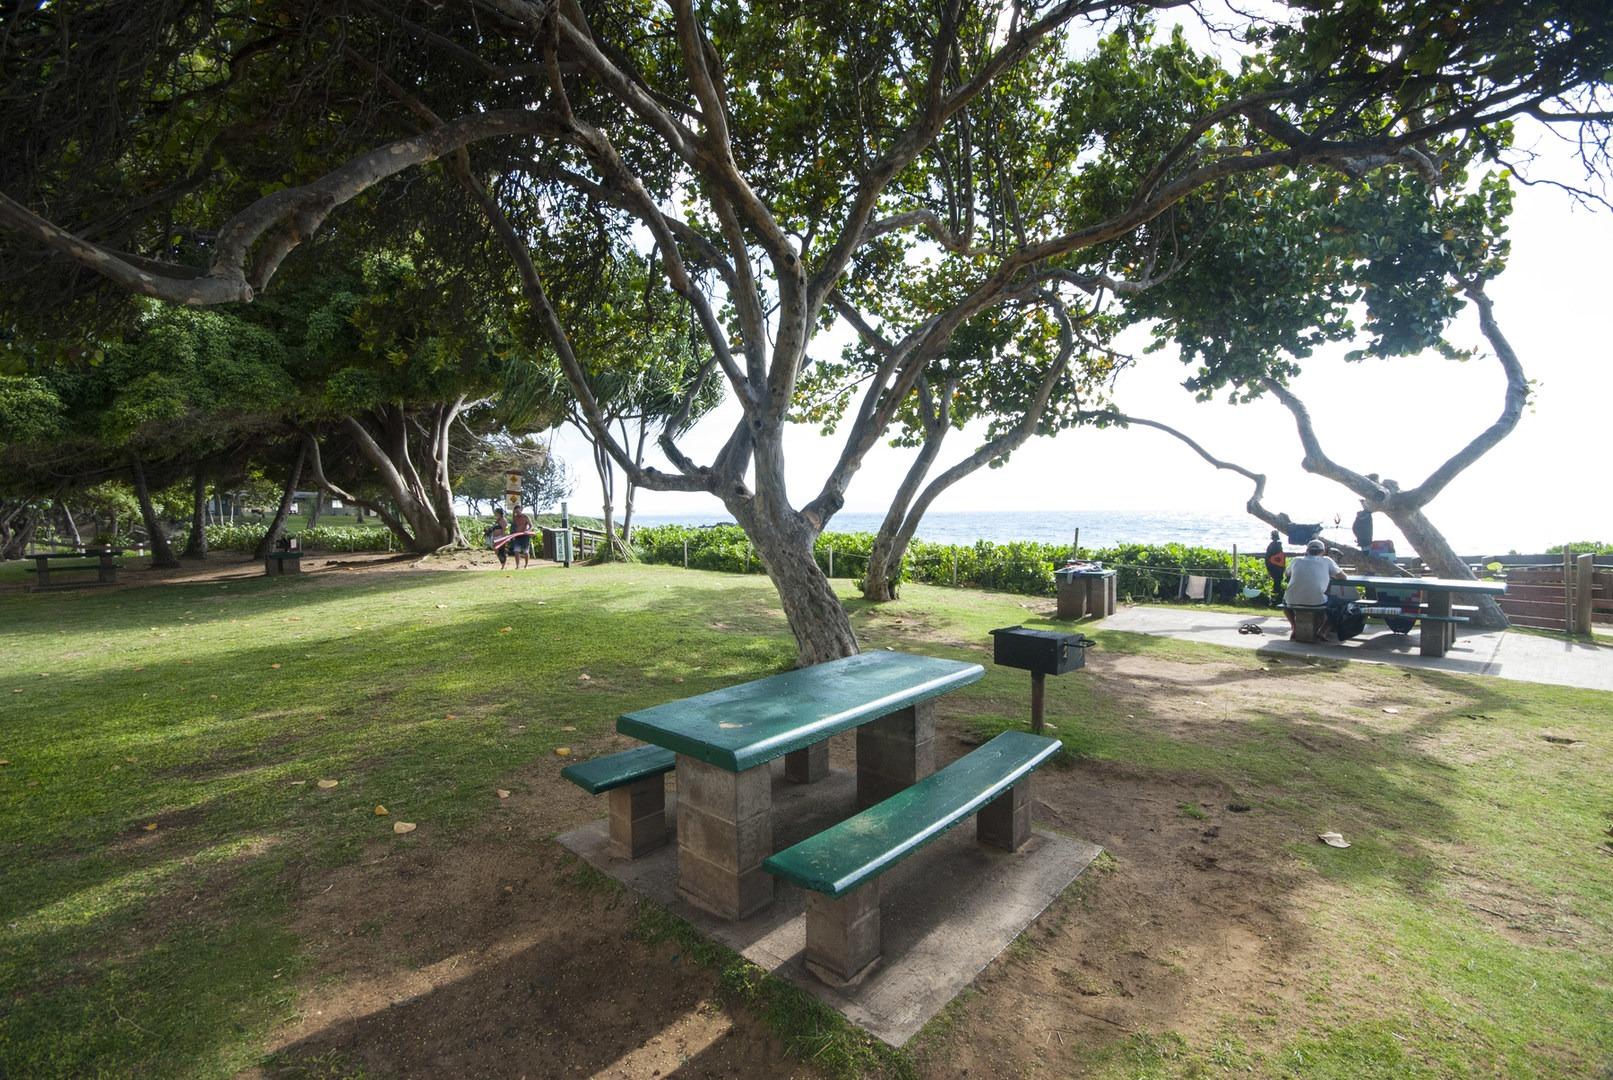 Picnic Area At Ole Beach Park 2